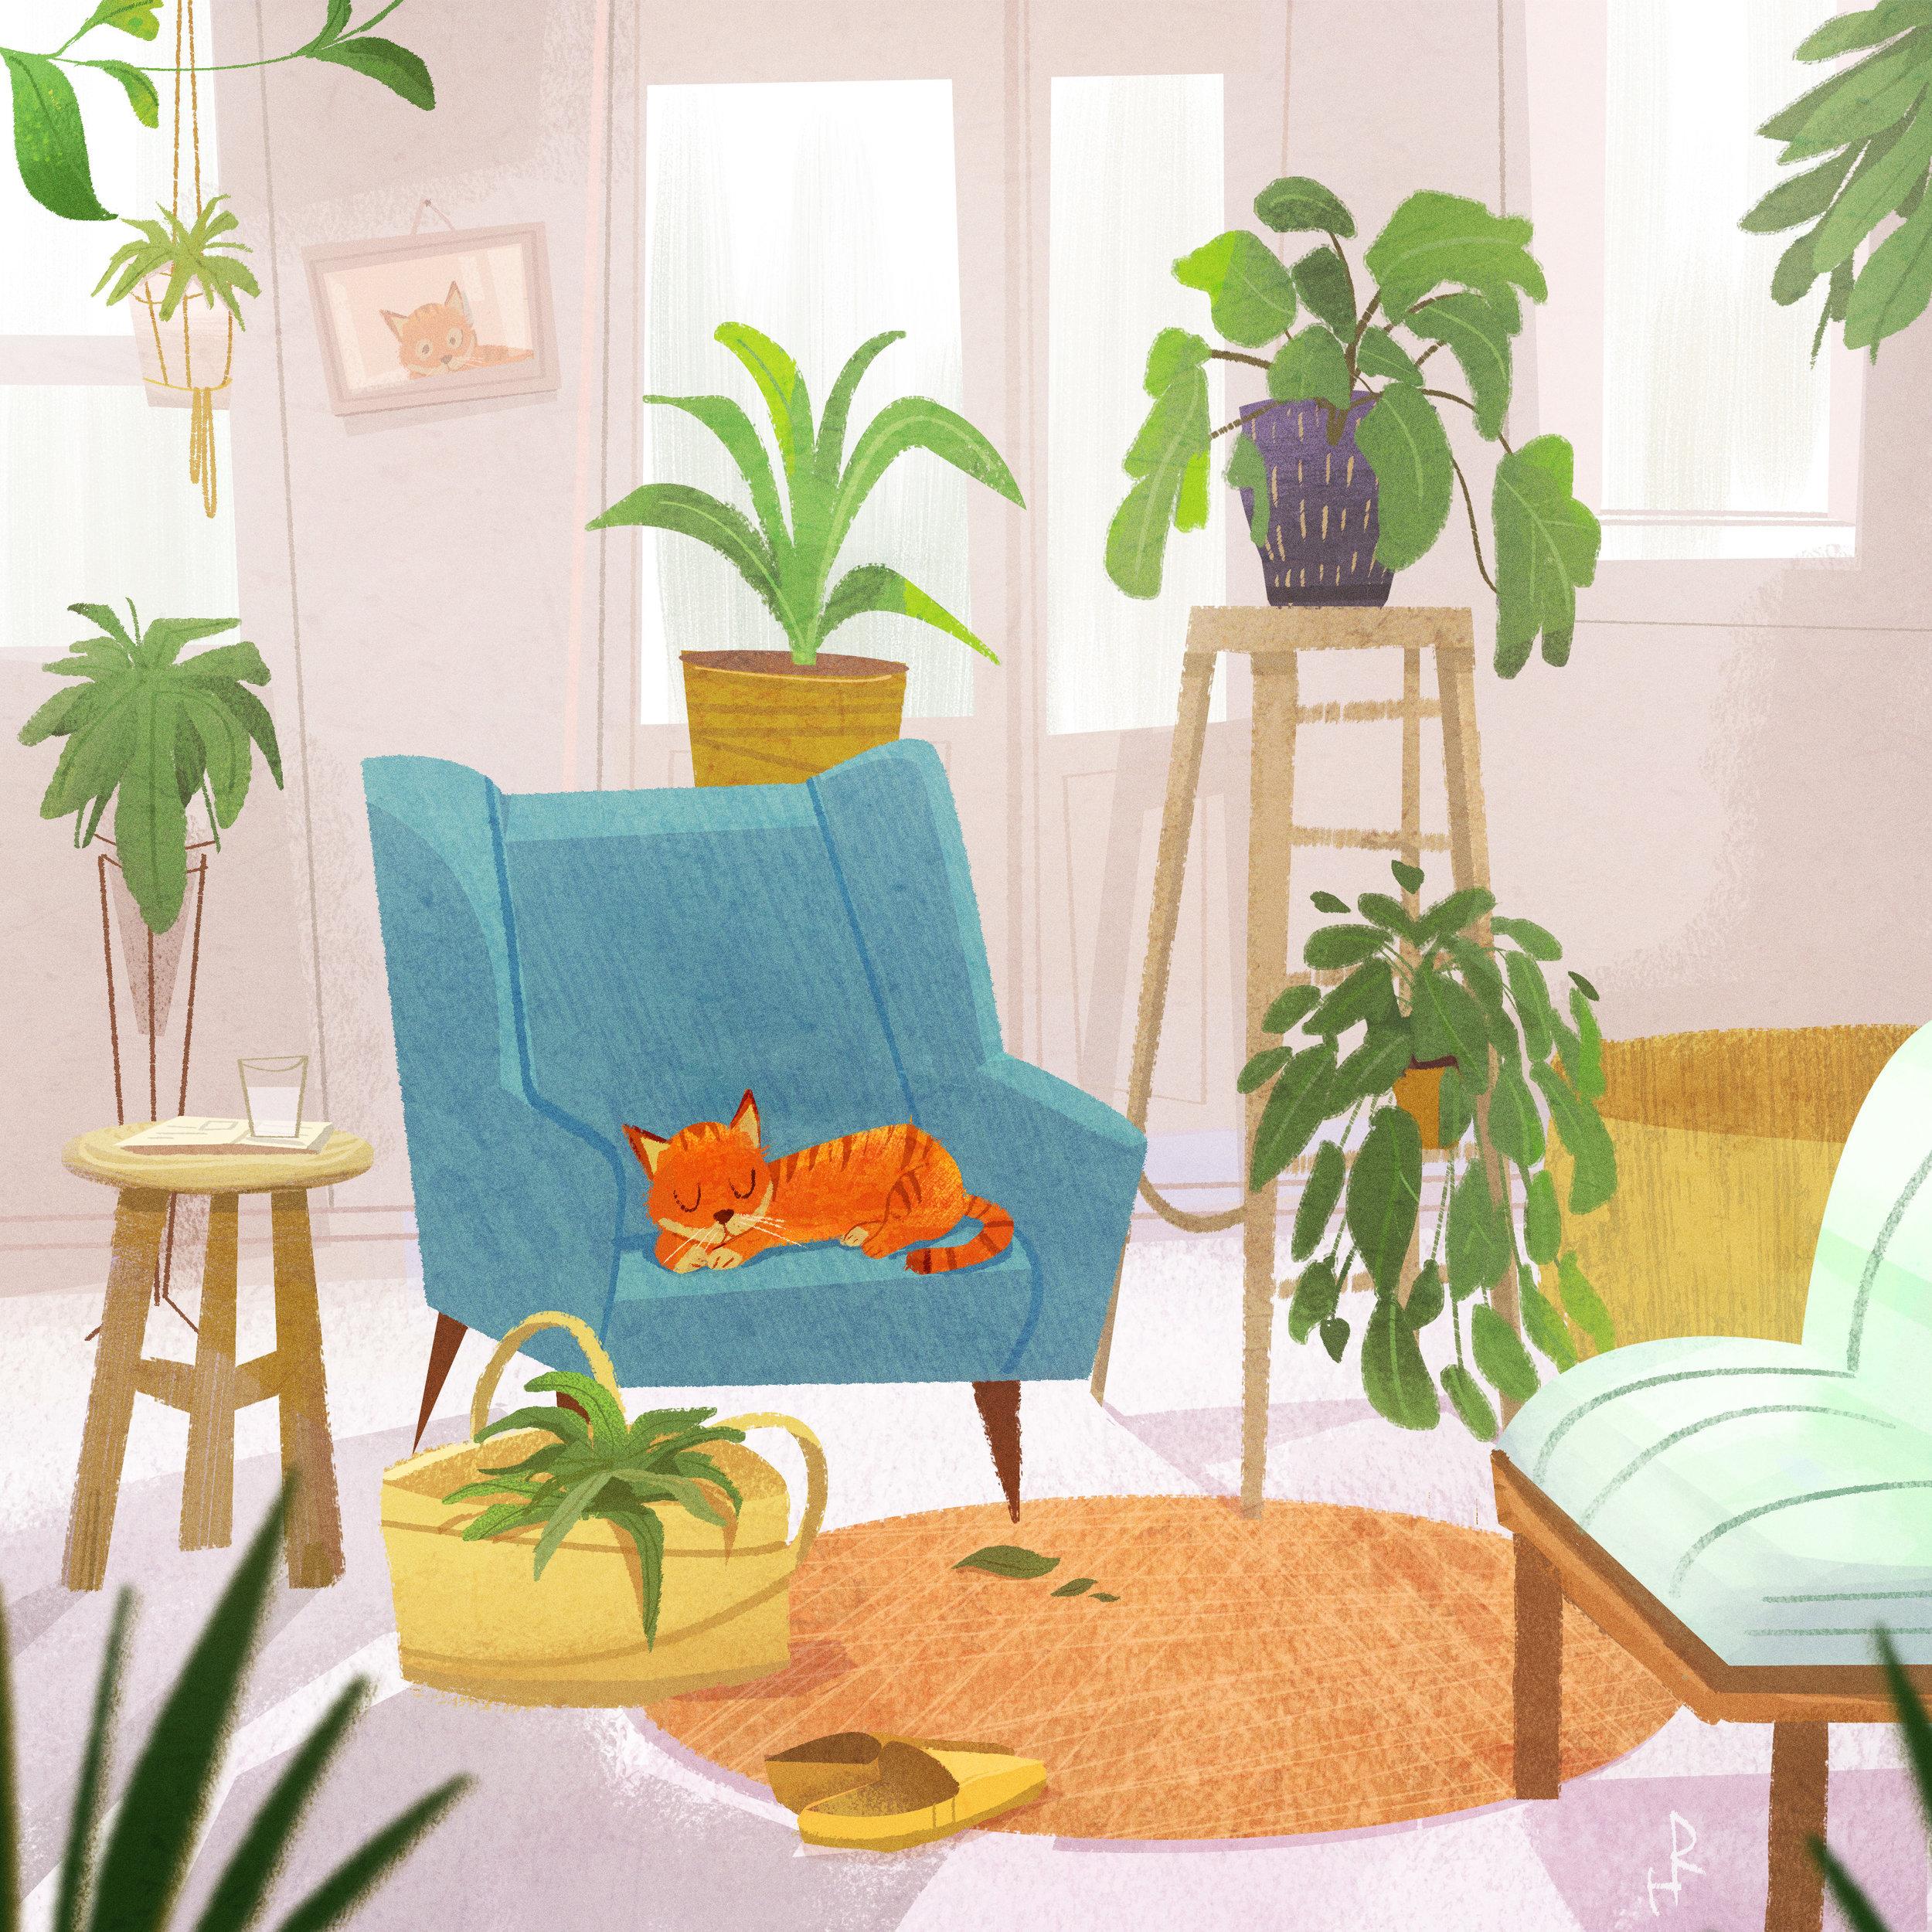 vignelli_plants.jpg